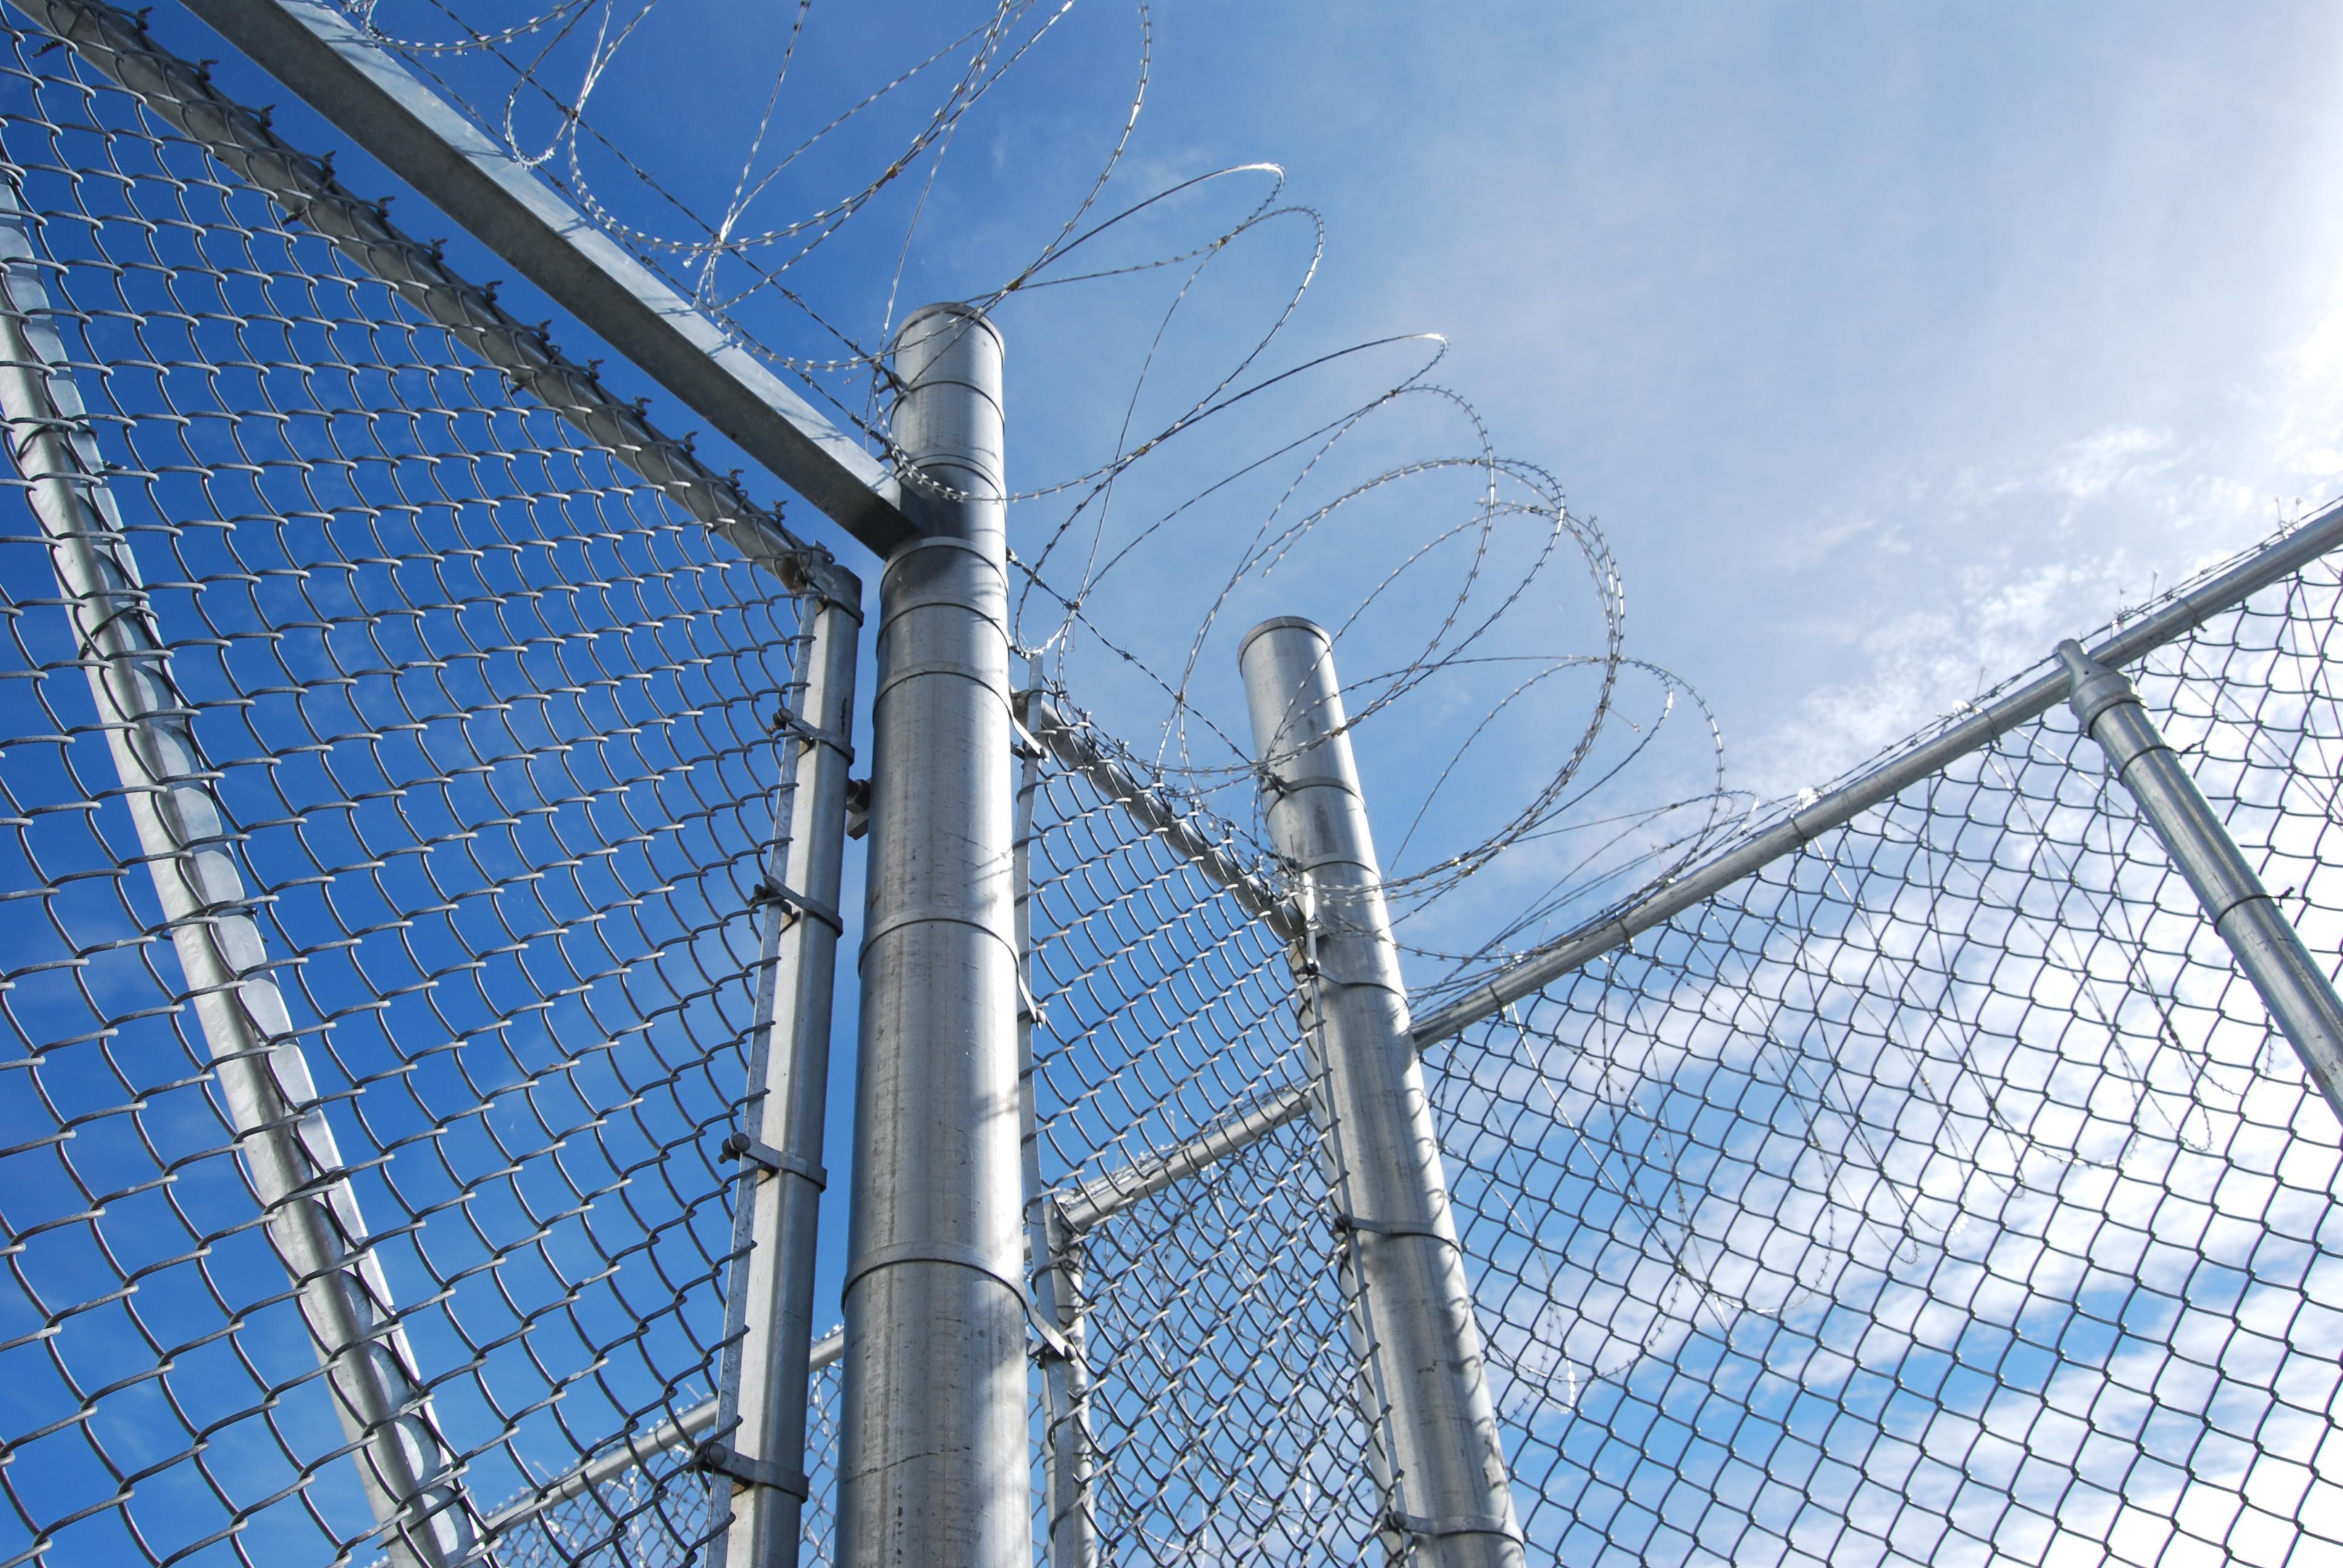 300 Tested at Hamblin Co. Jail for COVID-19